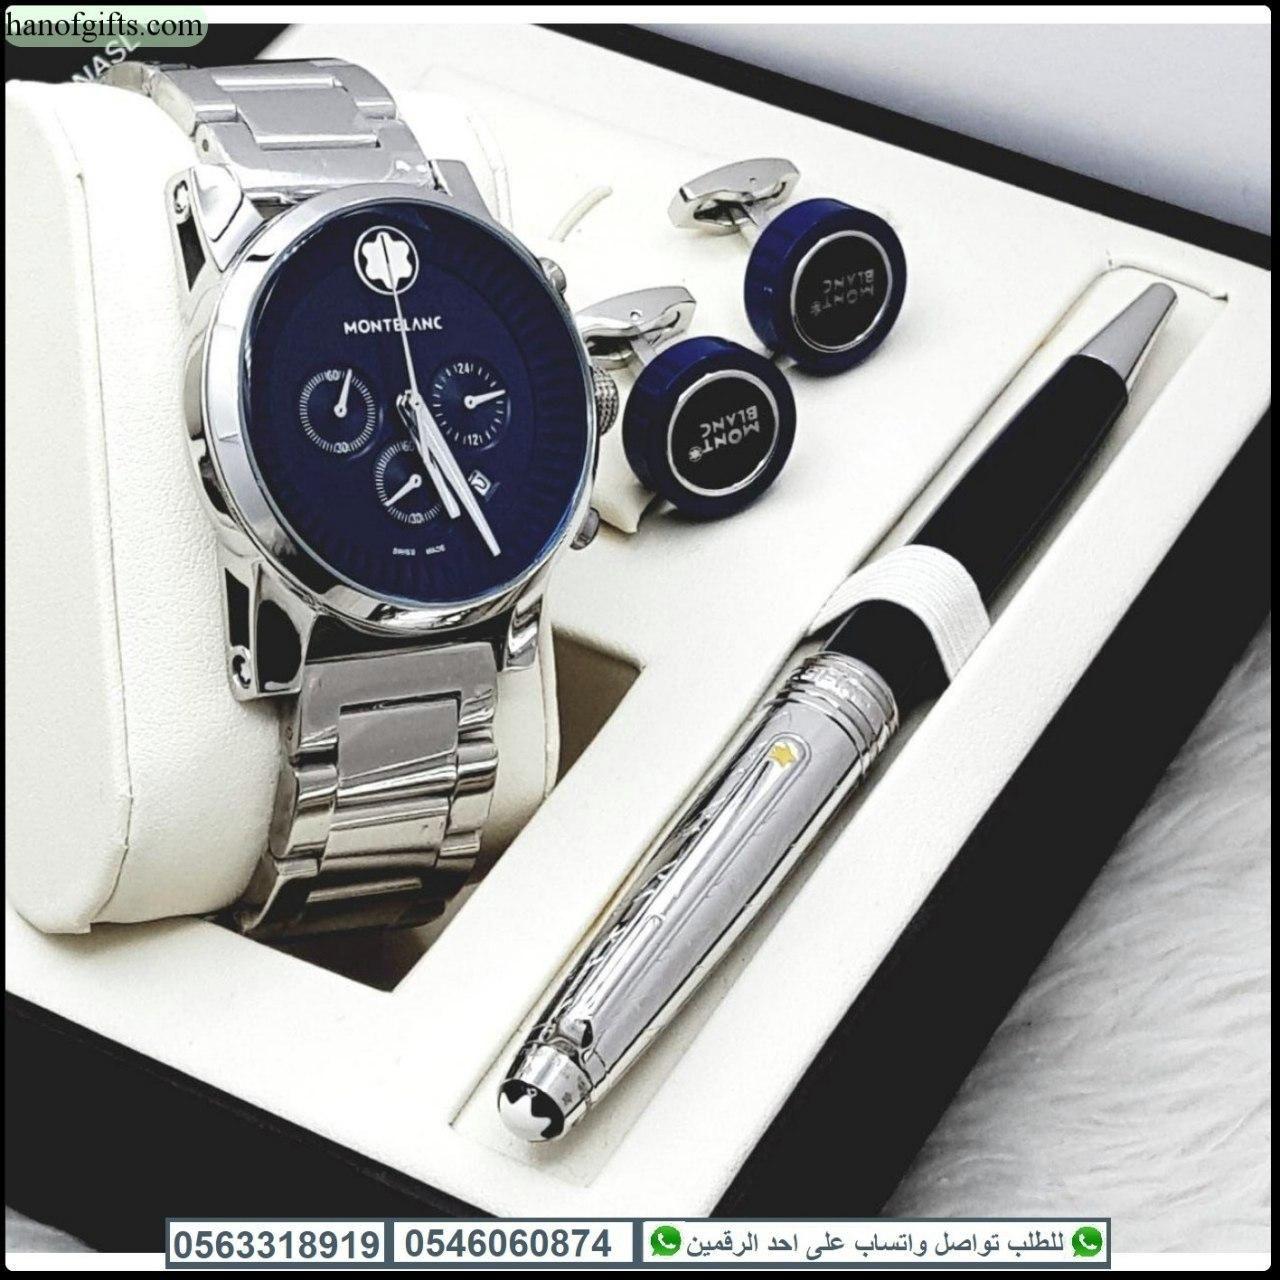 ساعات مونت بلانك رجاليه Mont Blanc درجه اولى مع قلم و كبك هدايا هنوف Mesh Strap Watch Mesh Strap Rolex Watches